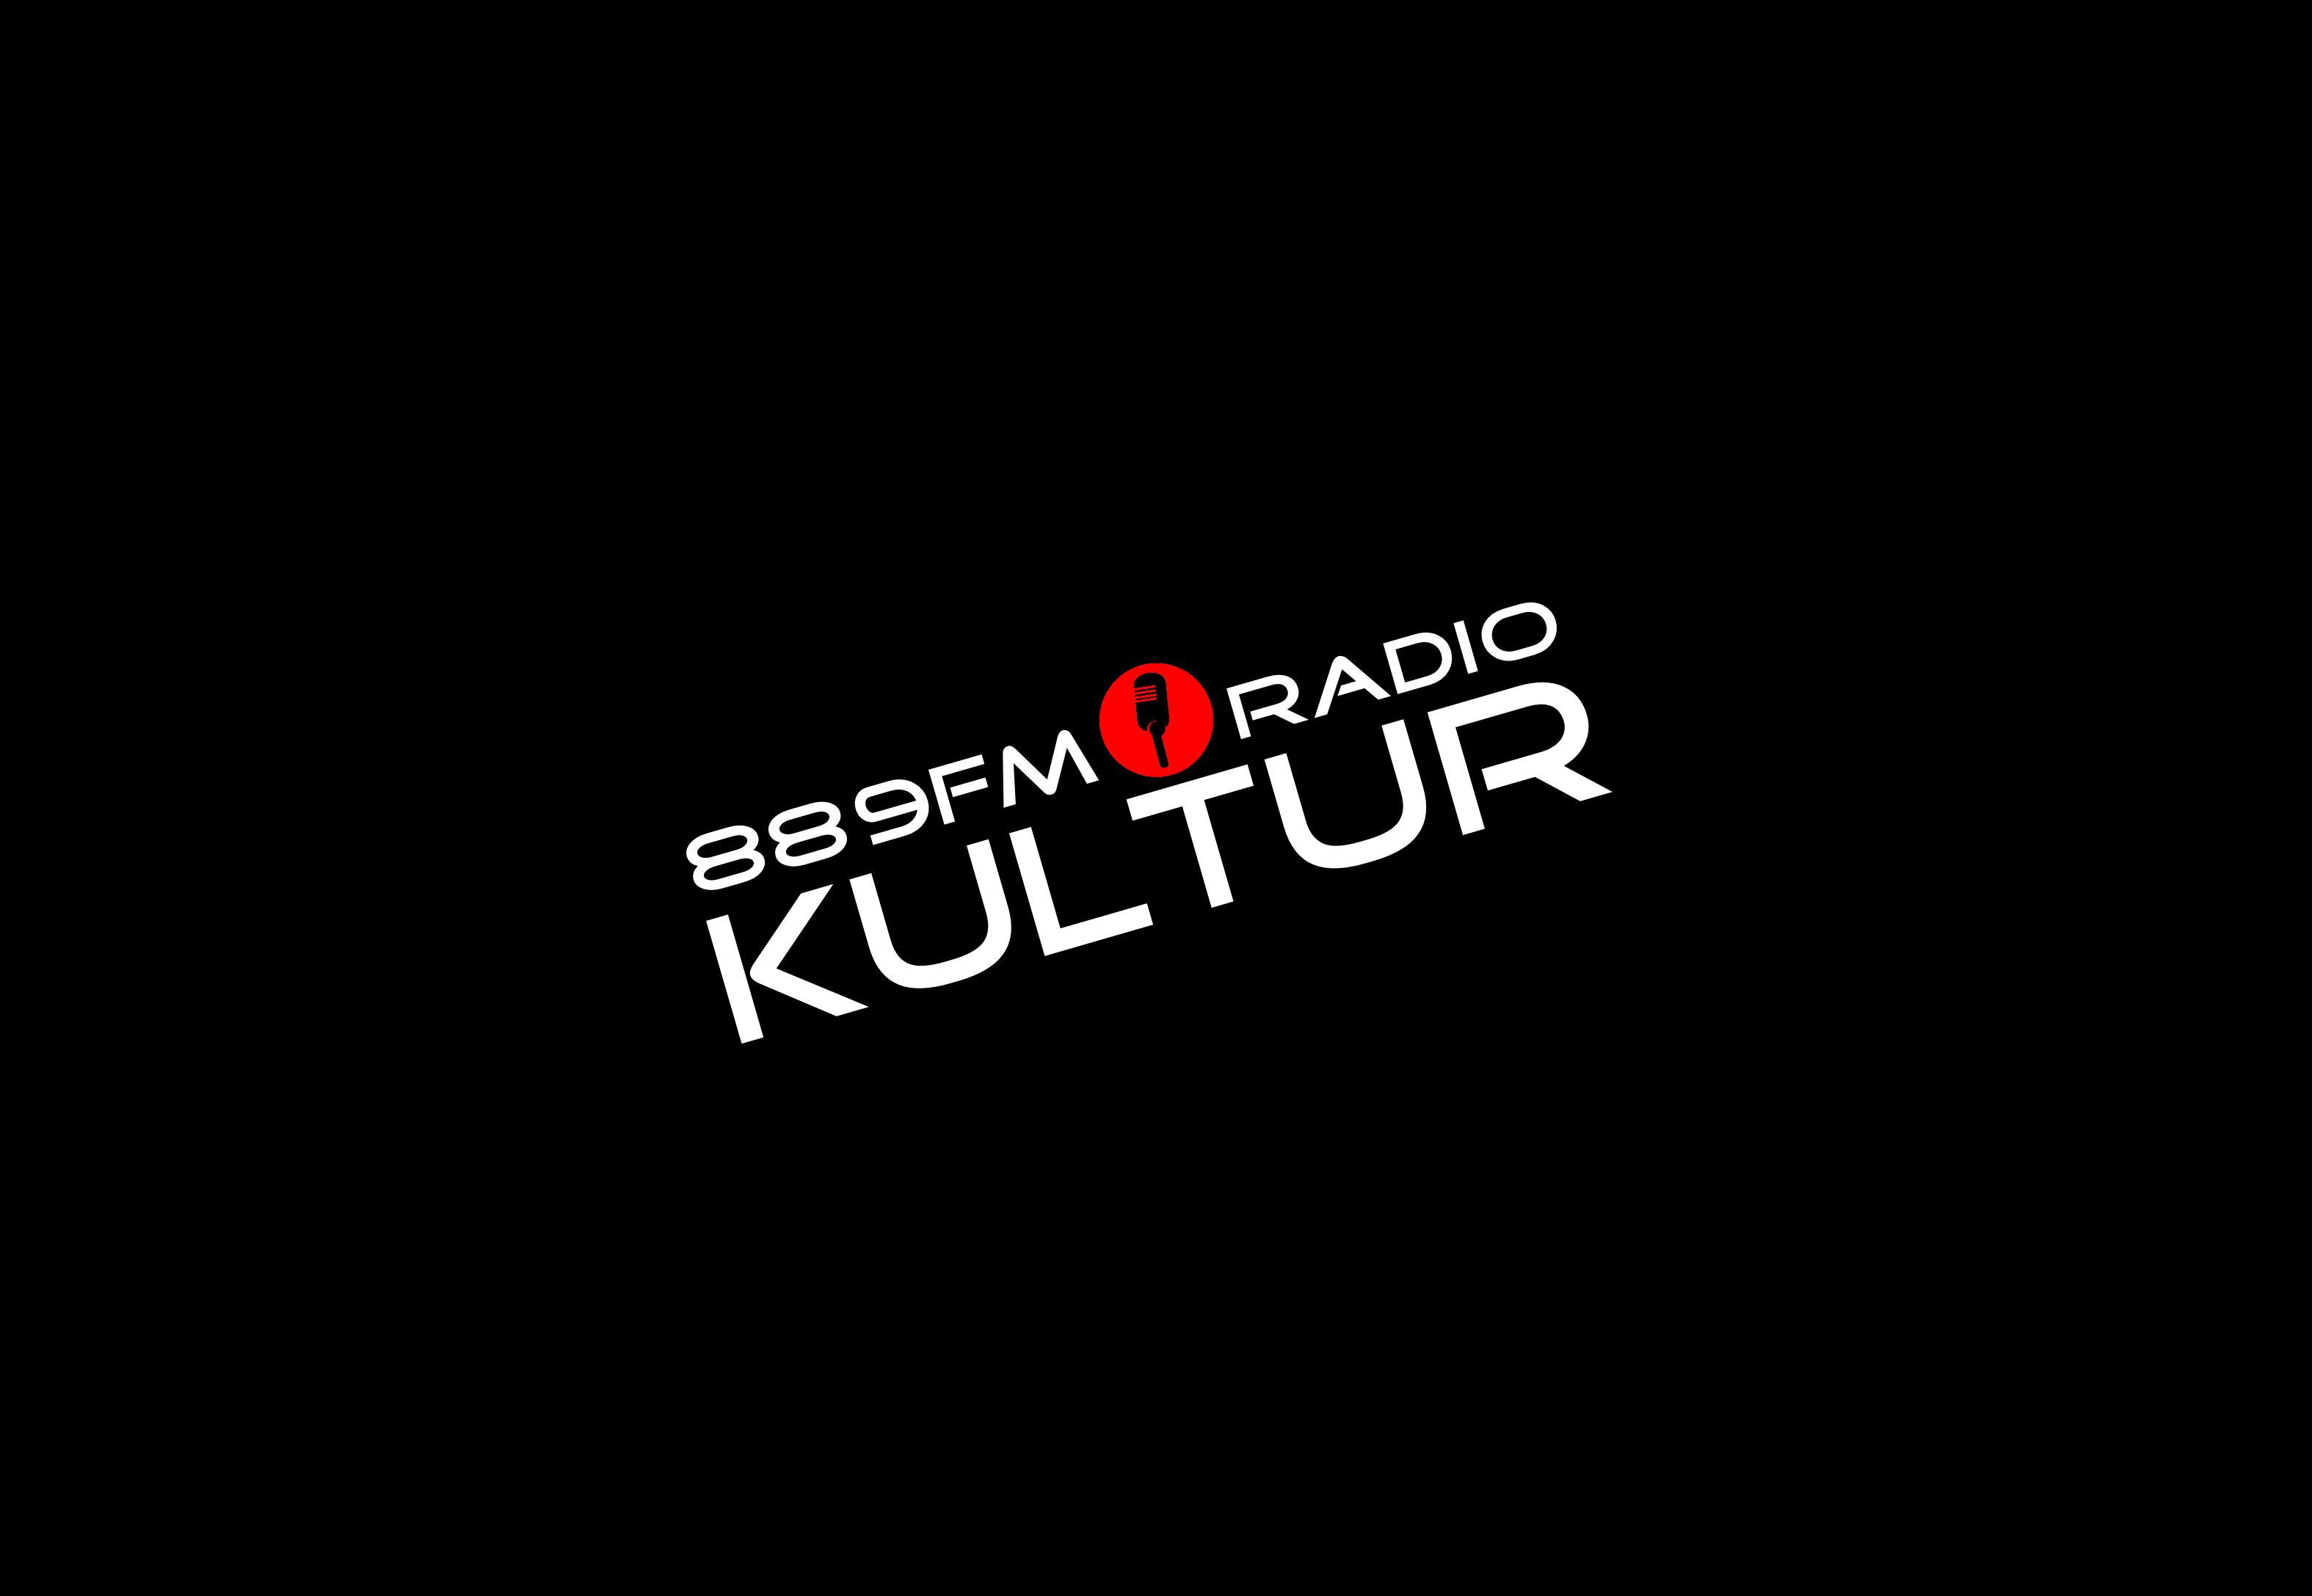 889fm Kultur, Radio 889FM